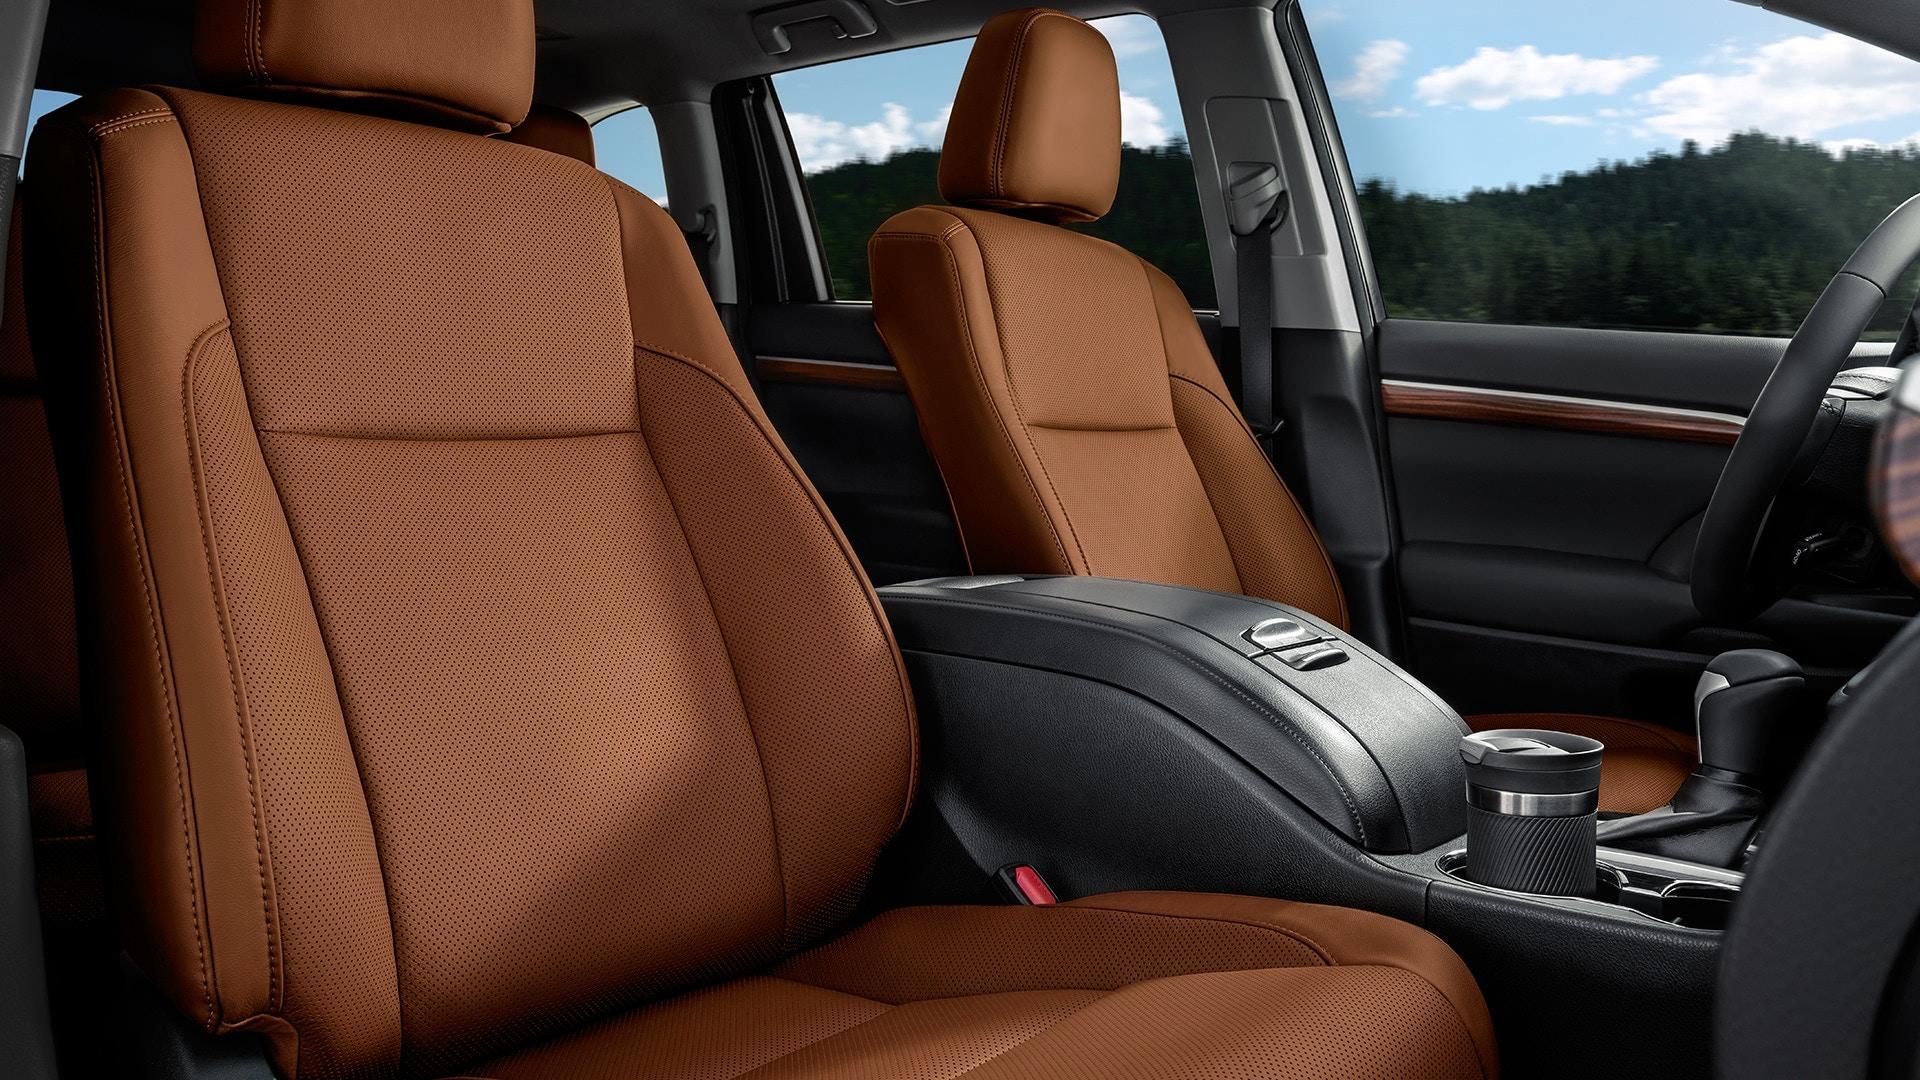 2019 Toyota Highlander Interior Seating